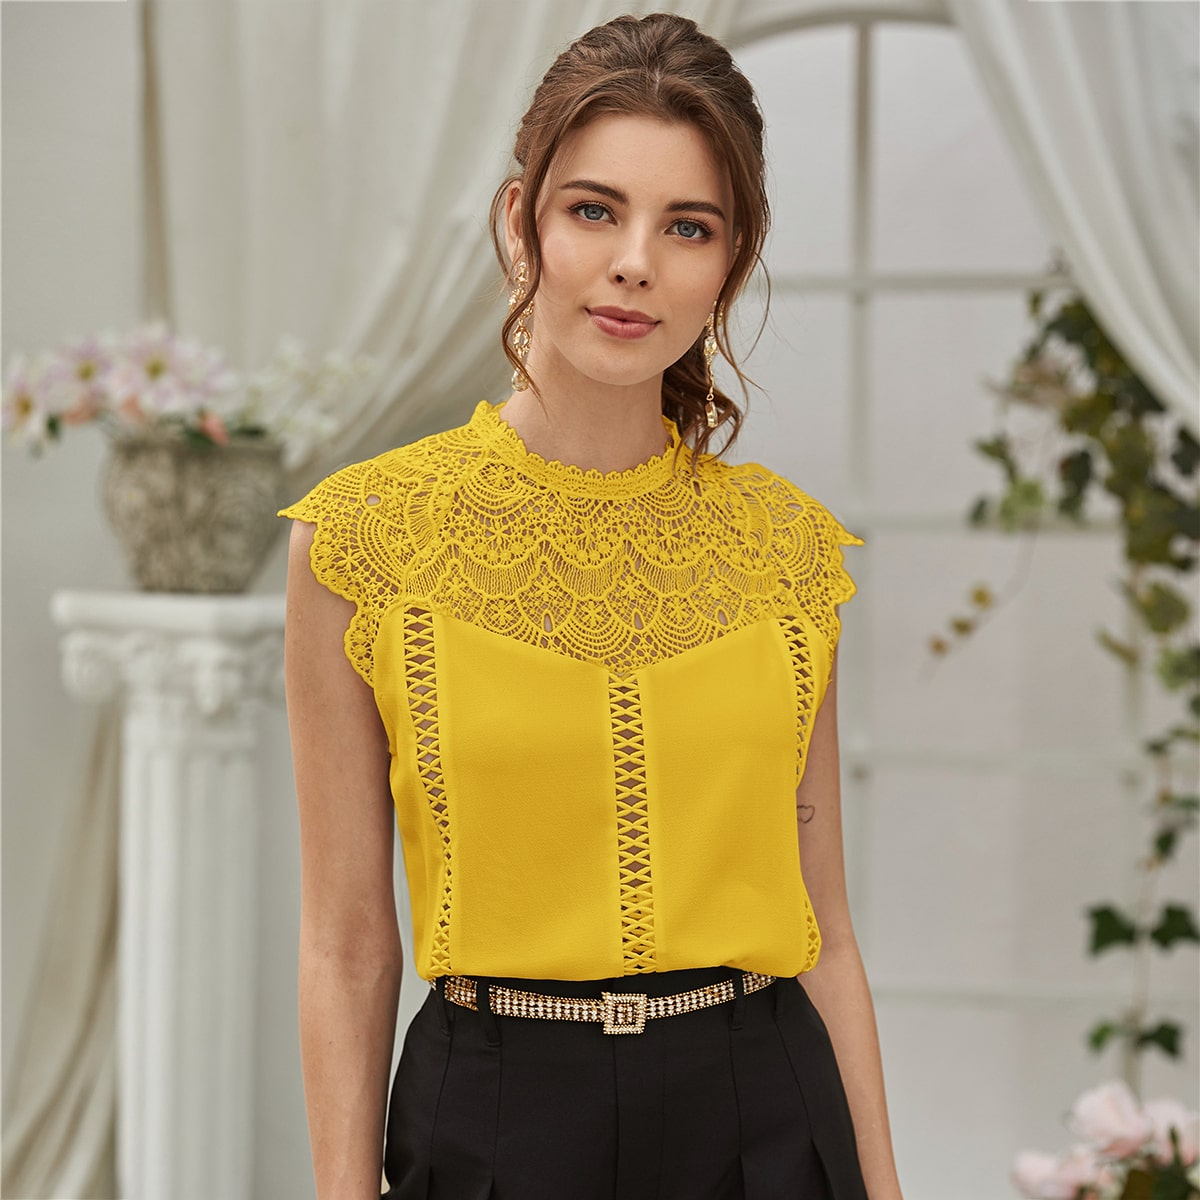 SHEIN / Blusas Encaje en contraste Liso Amarillo Elegante